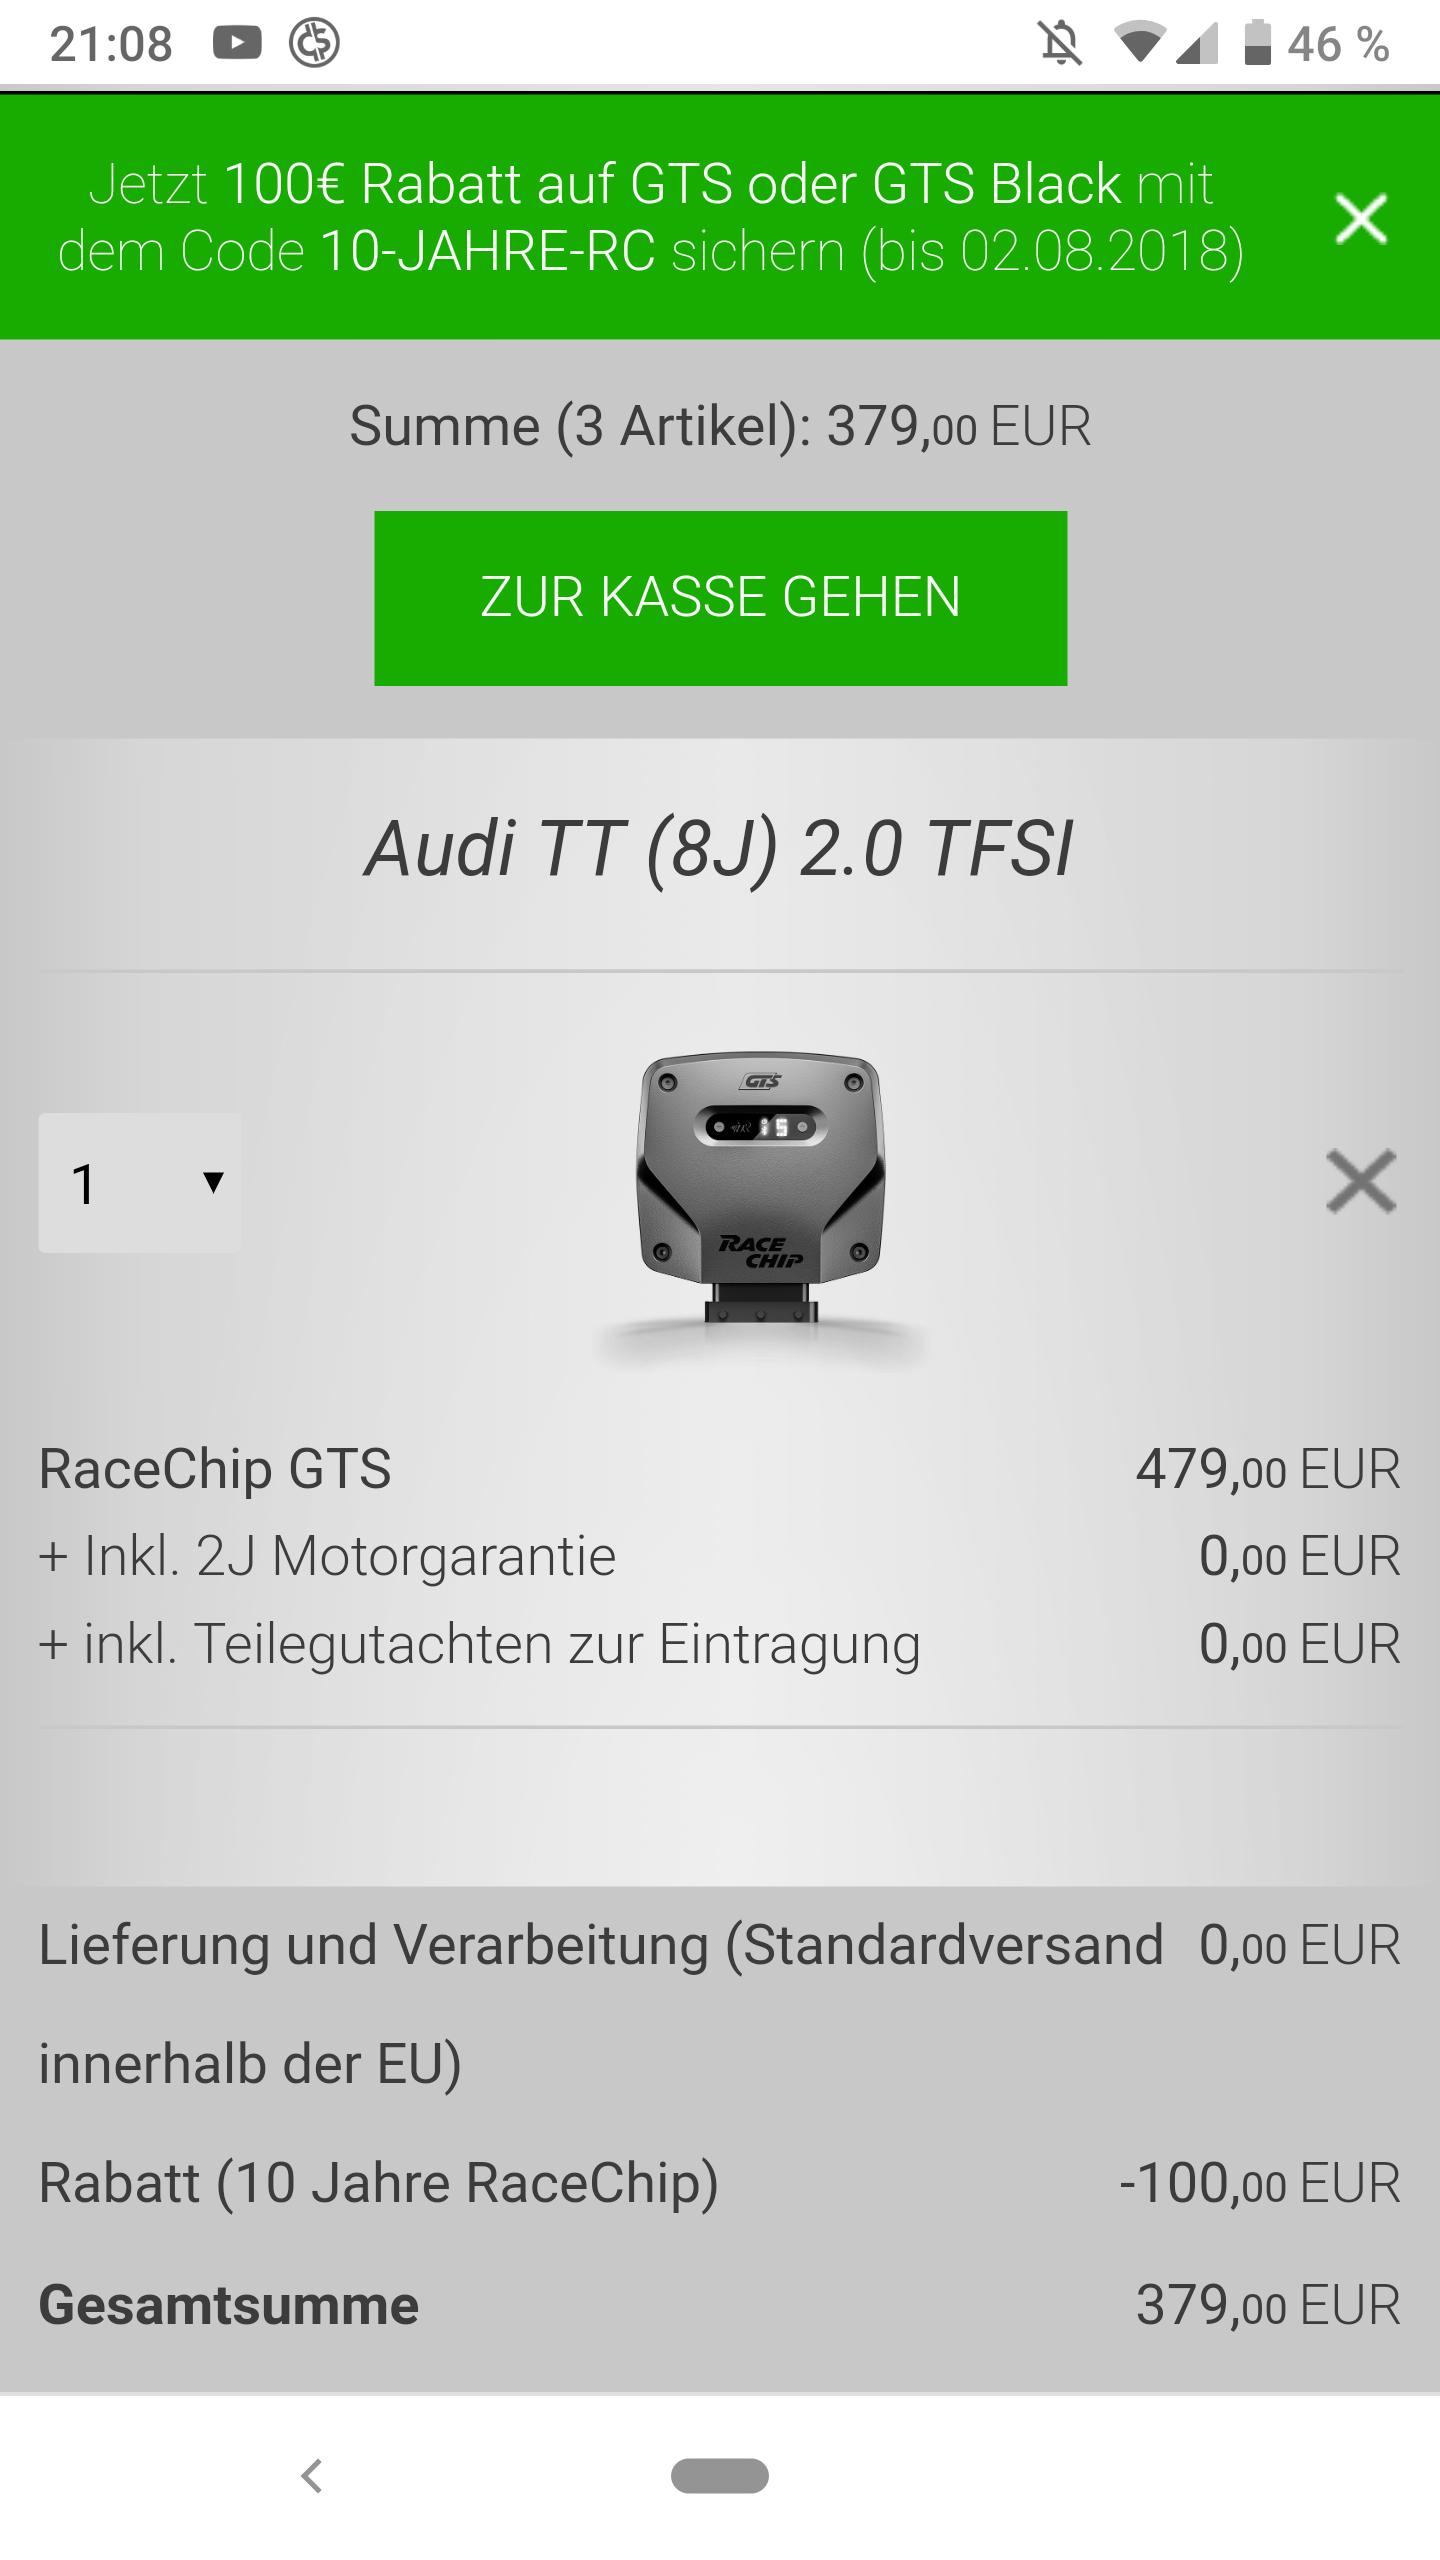 100€ Rabatt bei Racechip (GTS und GTS Black)